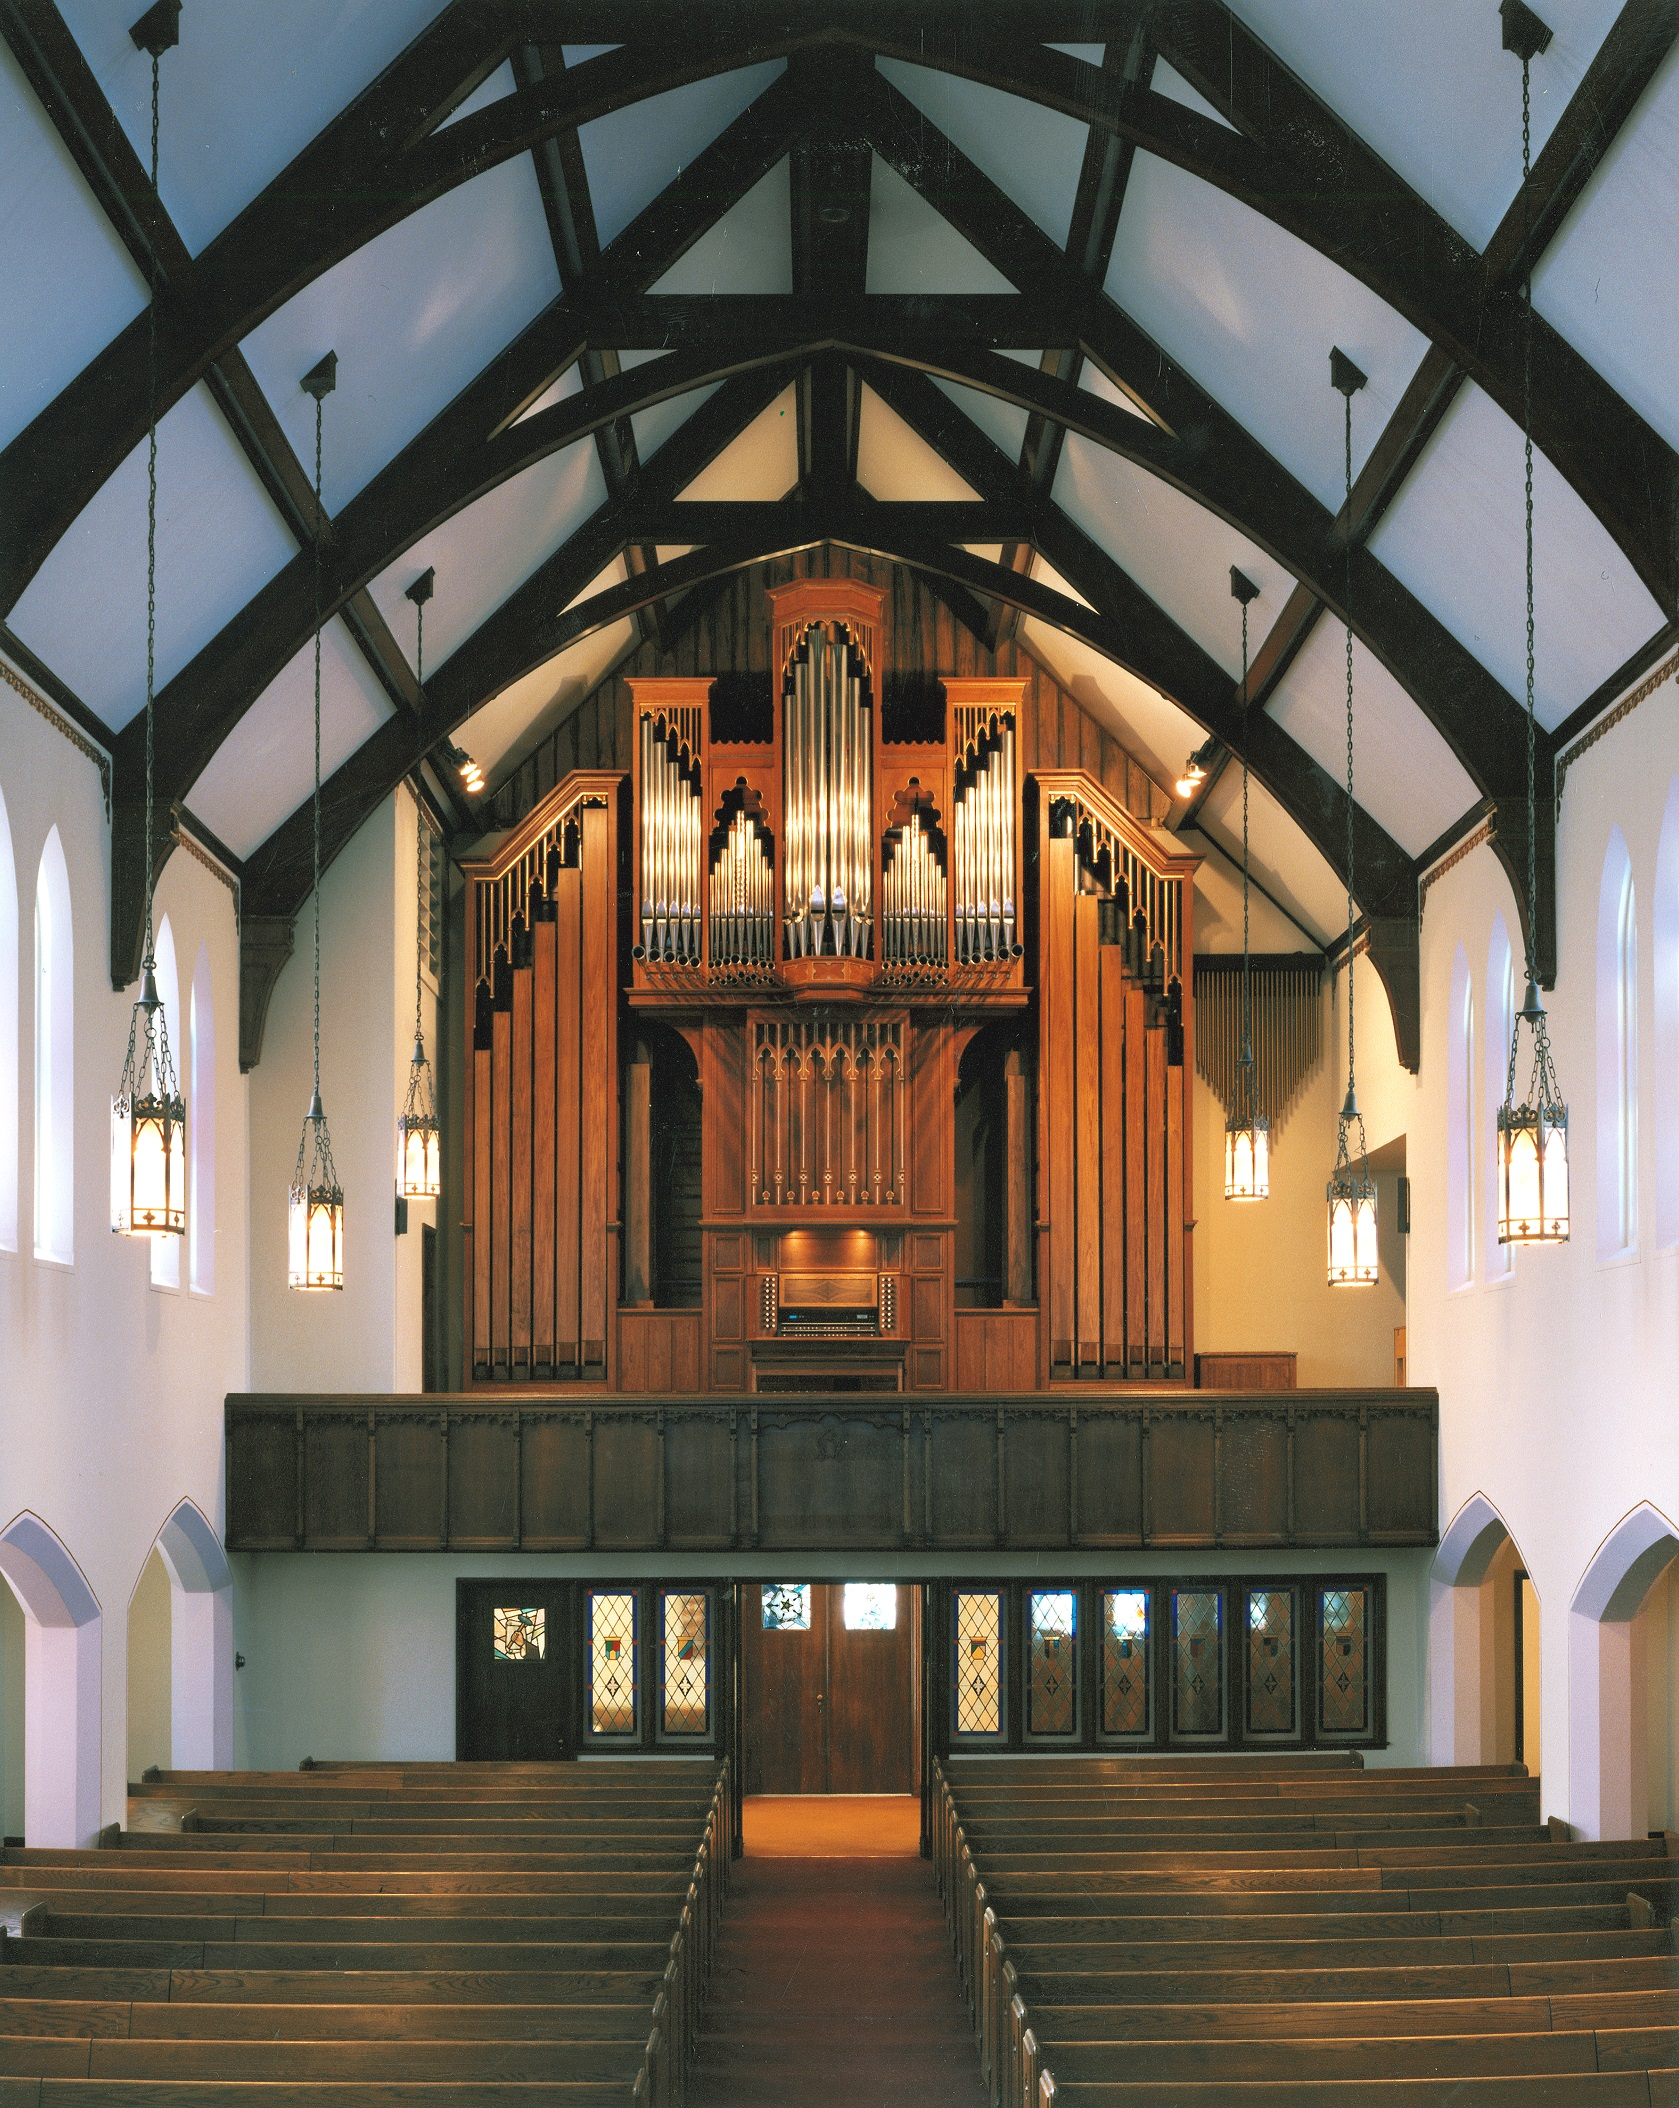 St. Johns Lutheran Church - LeMars, Iowa